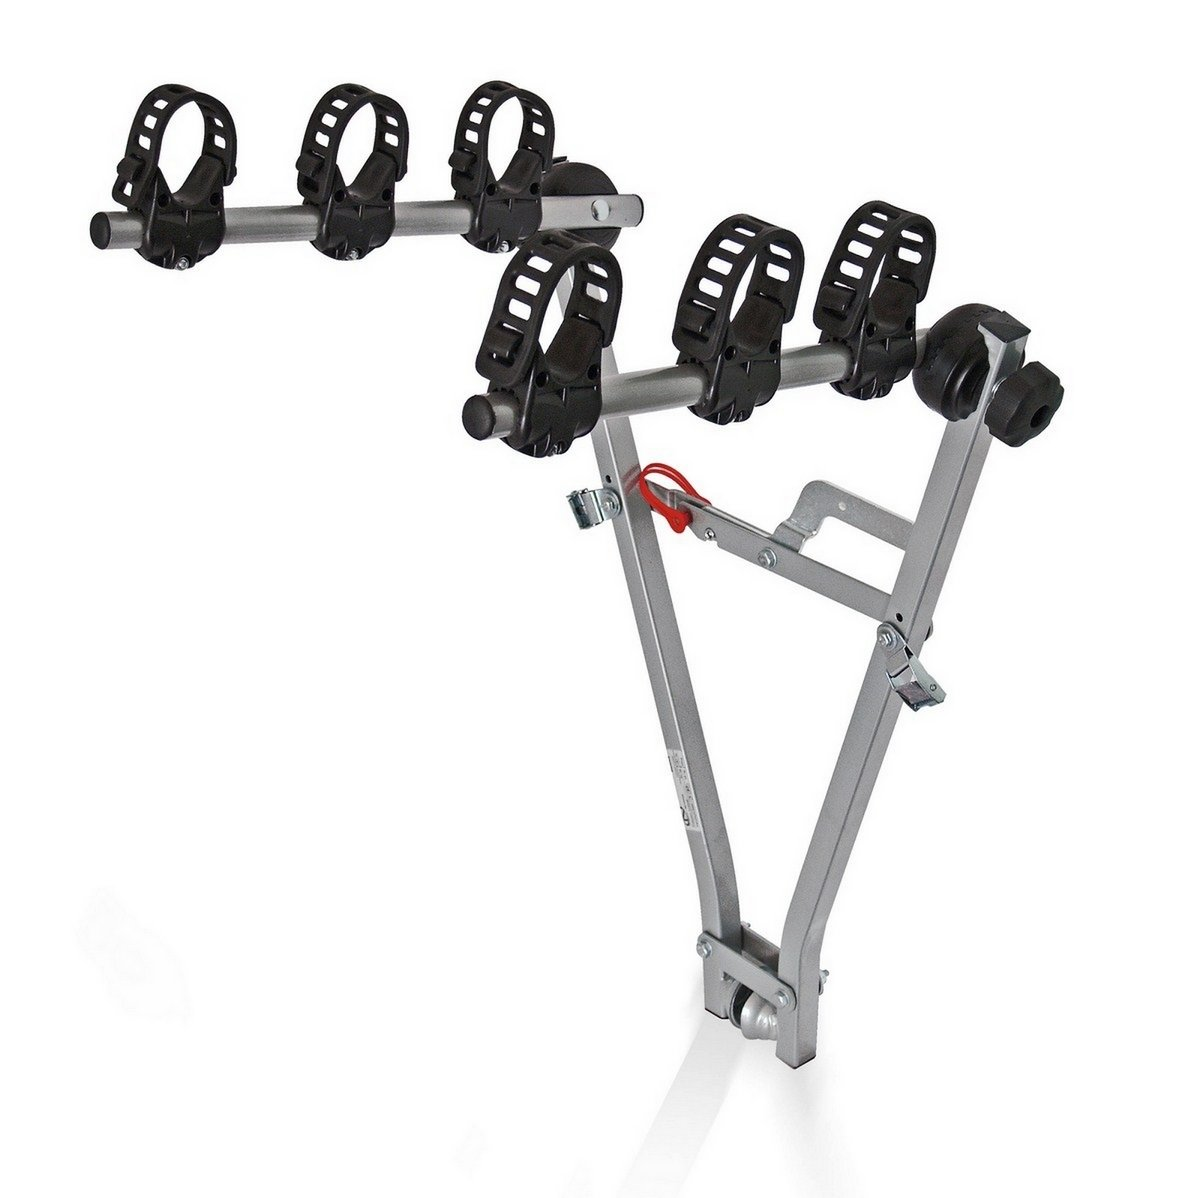 Silver//Black Plateado//Negro Menabo 869726G Portabici Enganche Bola 3 Bicicletas